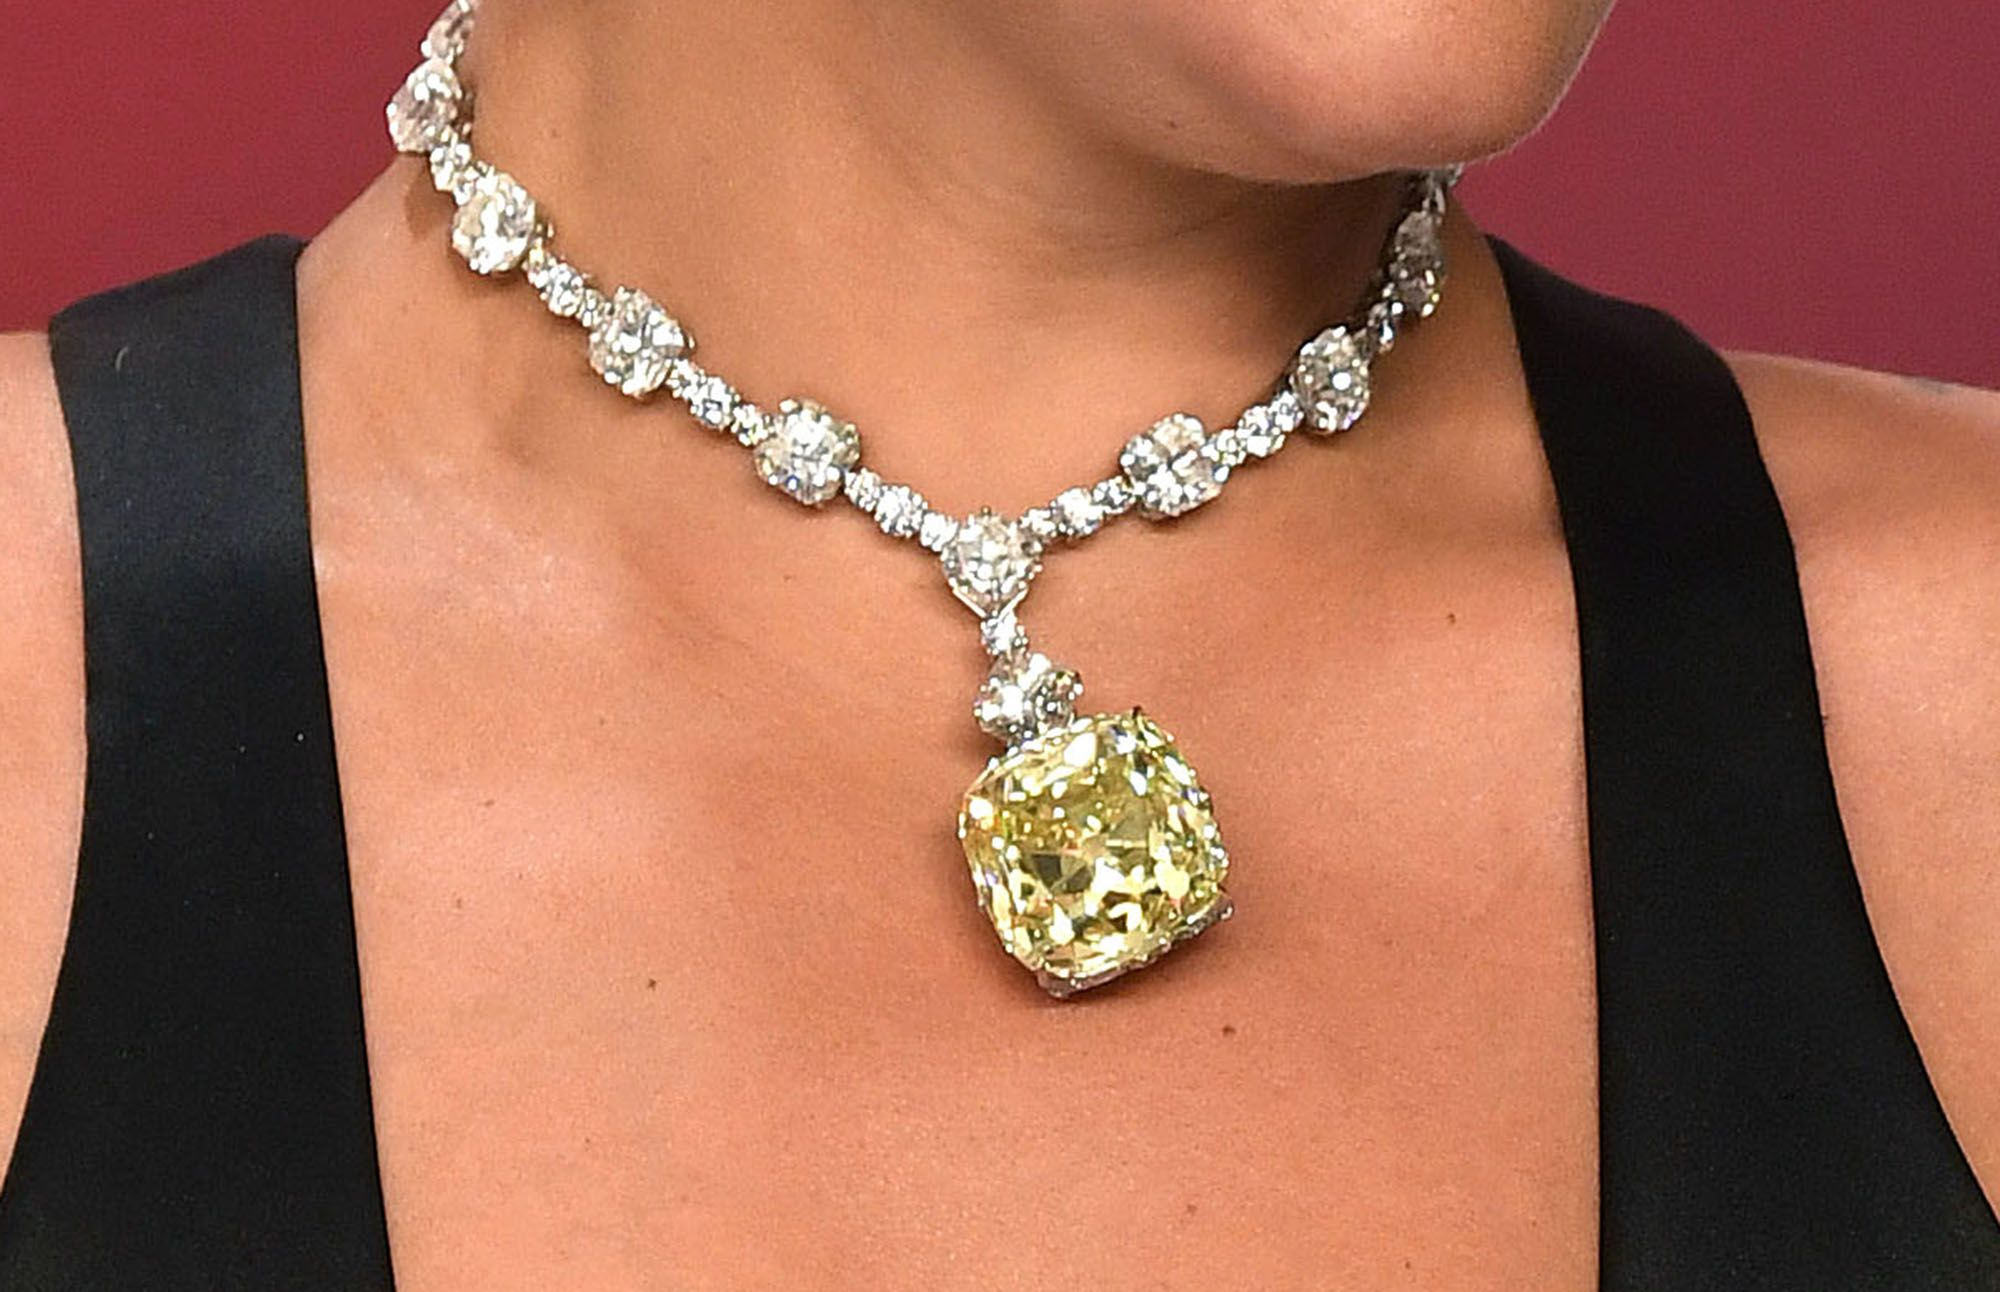 lady gaga necklace oscars 2020